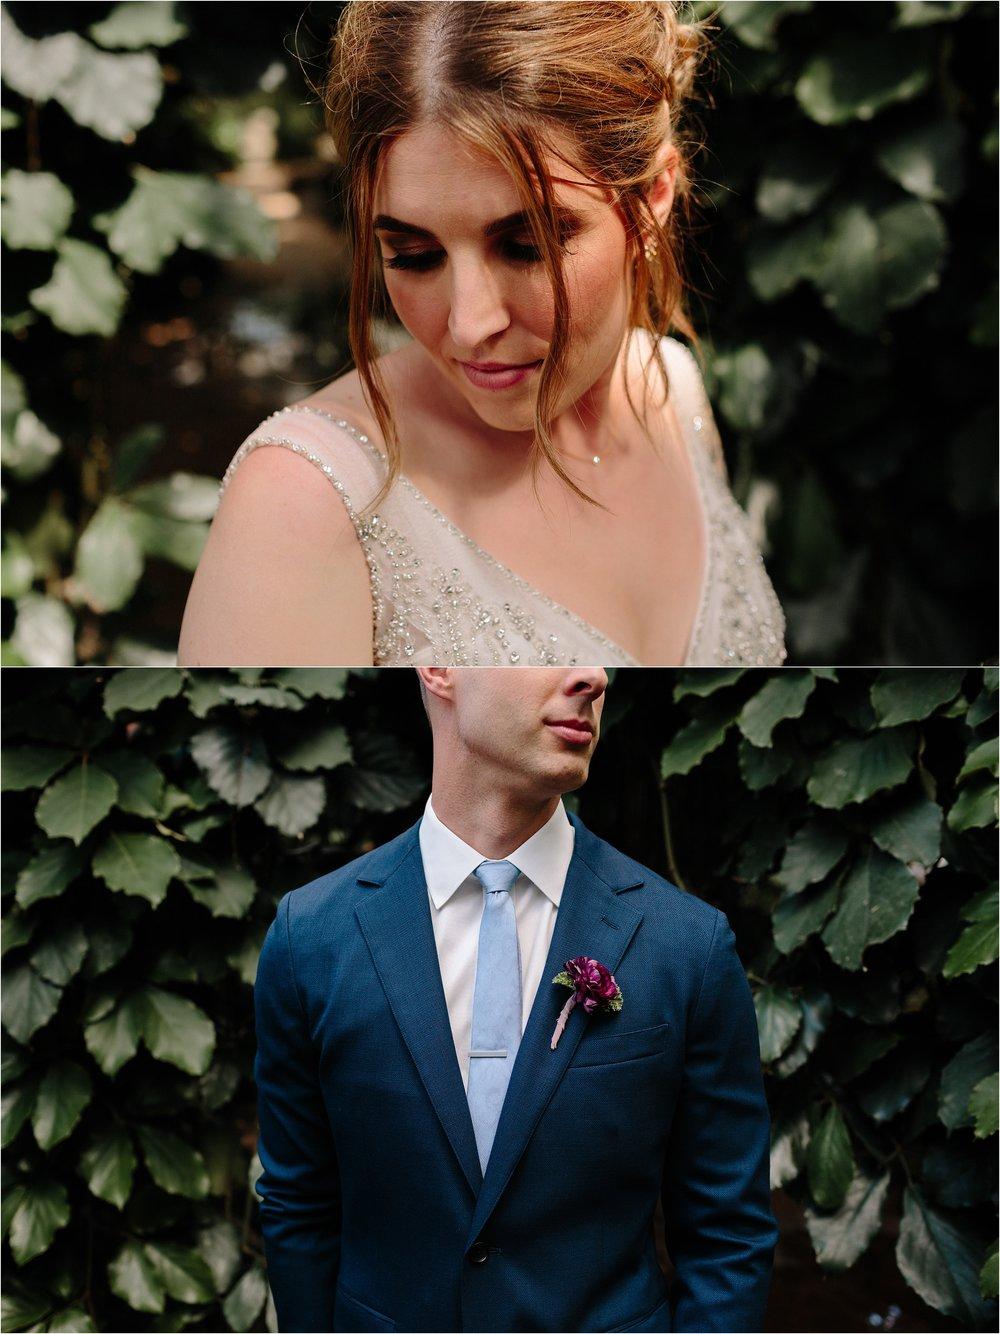 garfield-park-conservatory-wedding-141.jpg